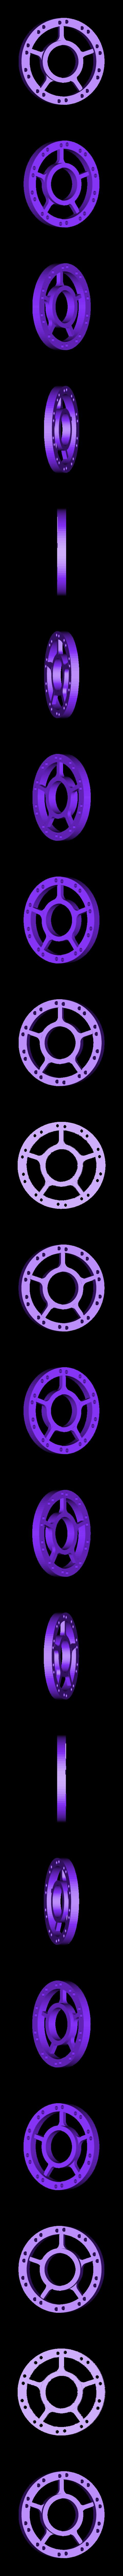 rear_rotor.stl Download free STL file 2016 Ducati Draxter Concept Drag Bike RC • 3D printer template, brett